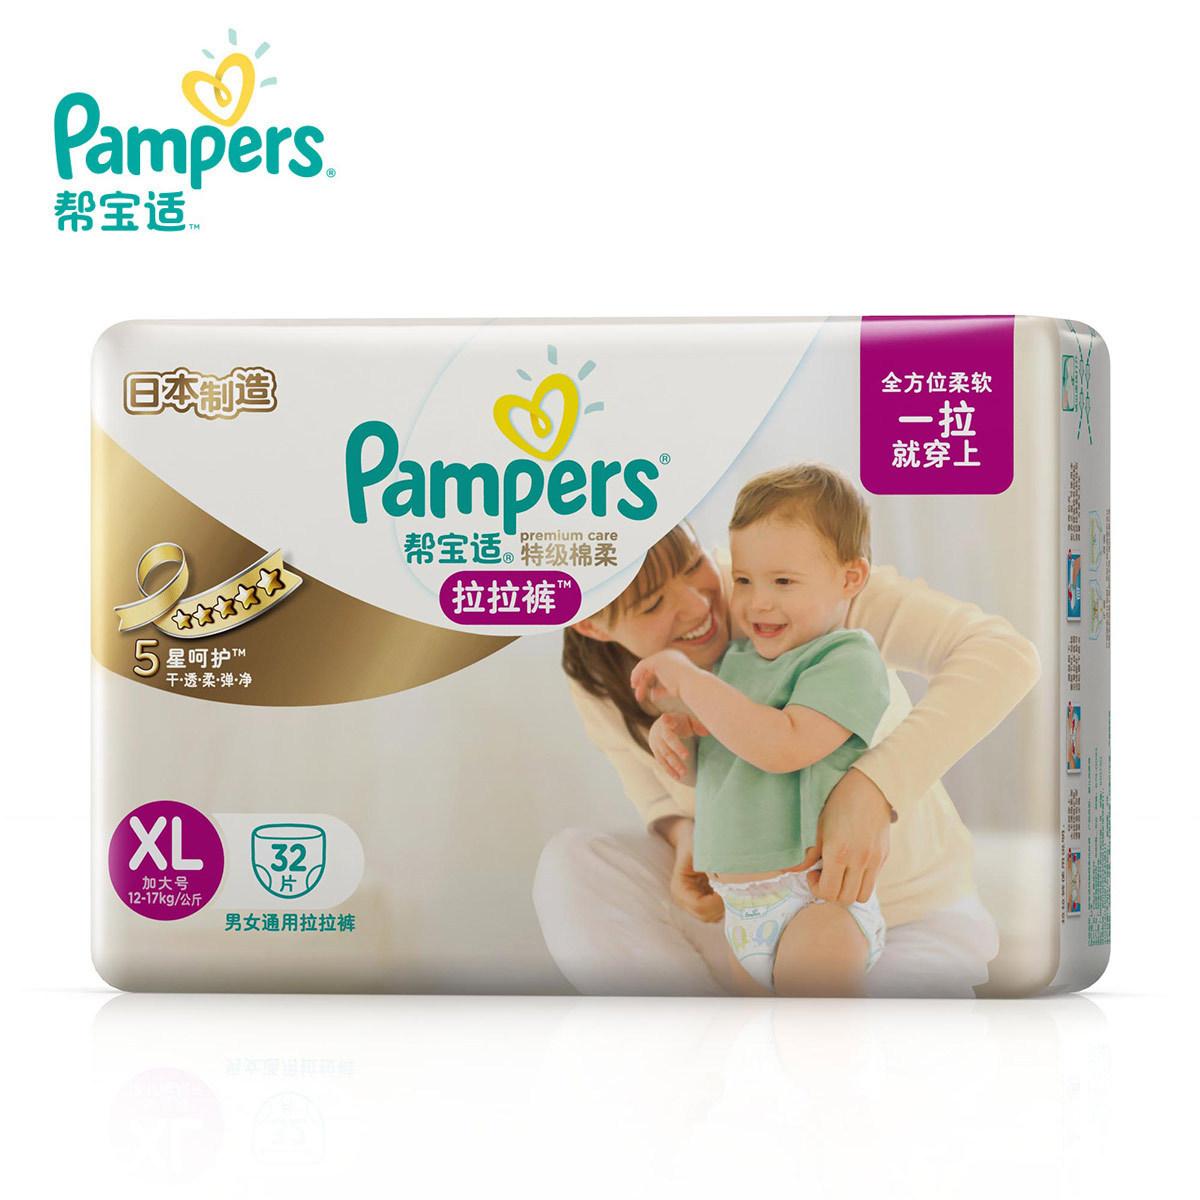 P ers 幫寶適 特級棉柔 拉拉褲  XL32片